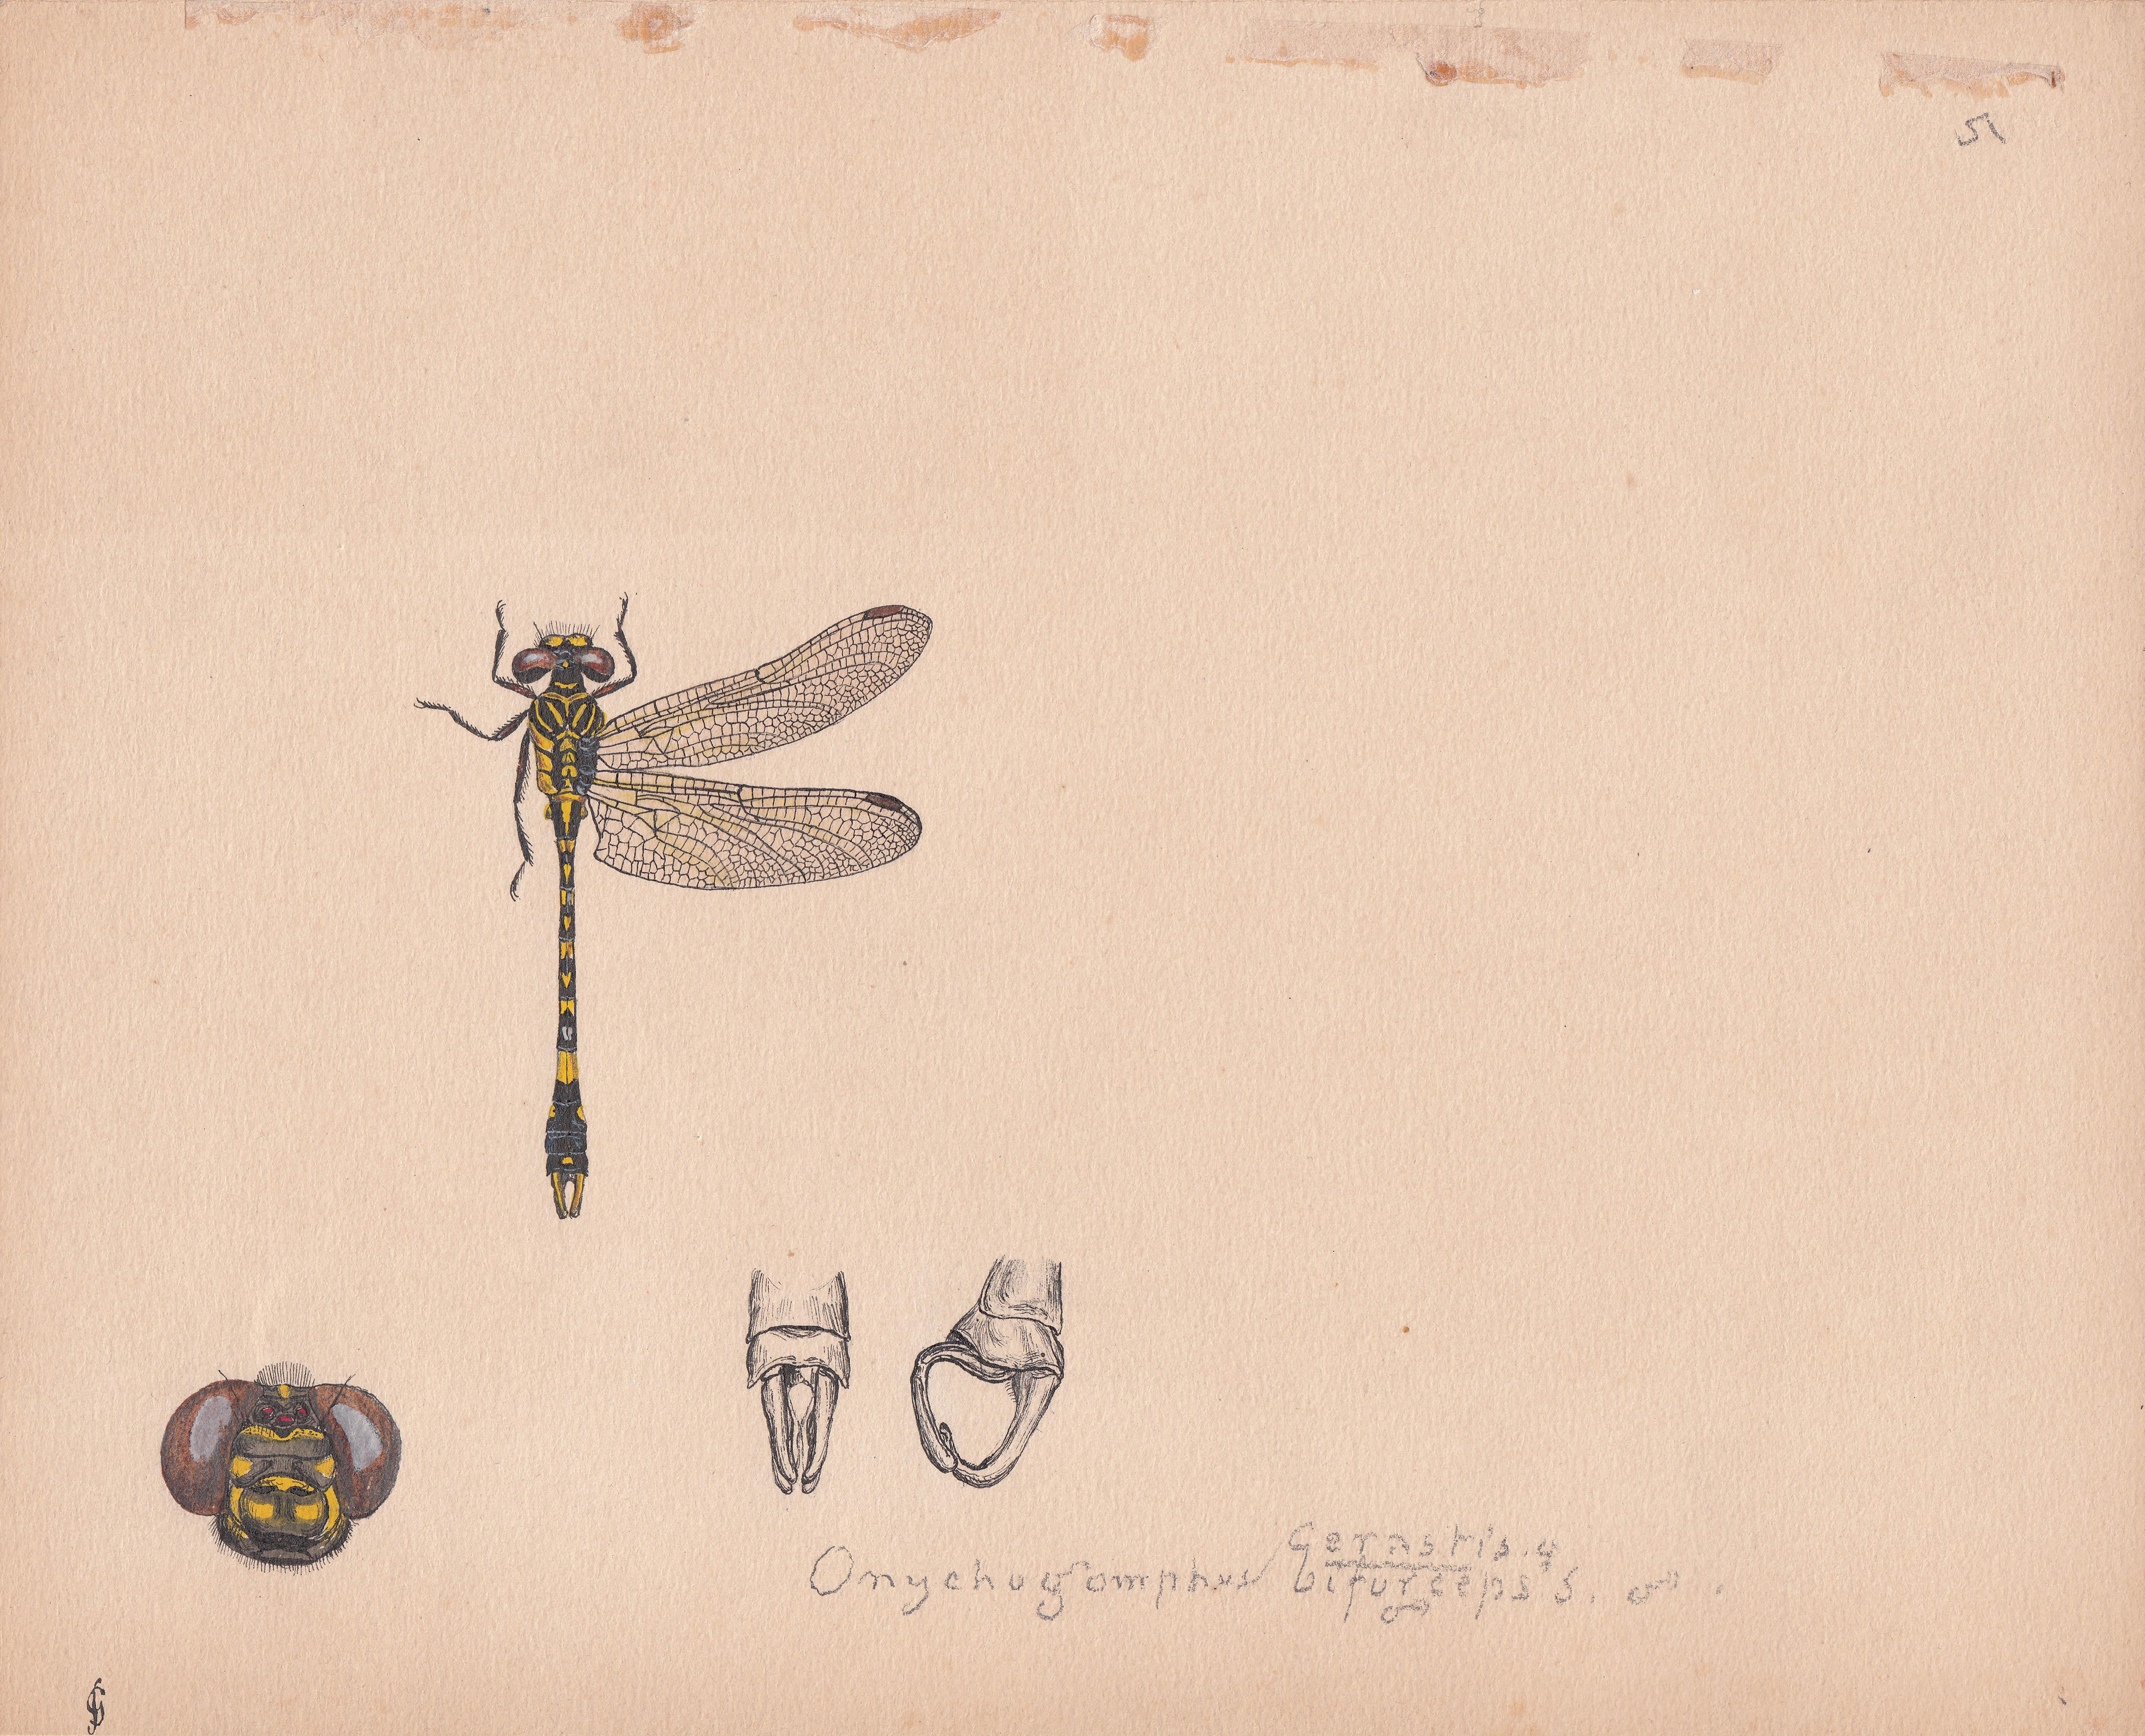 Onychogomphus cerastis biforceps.jpg